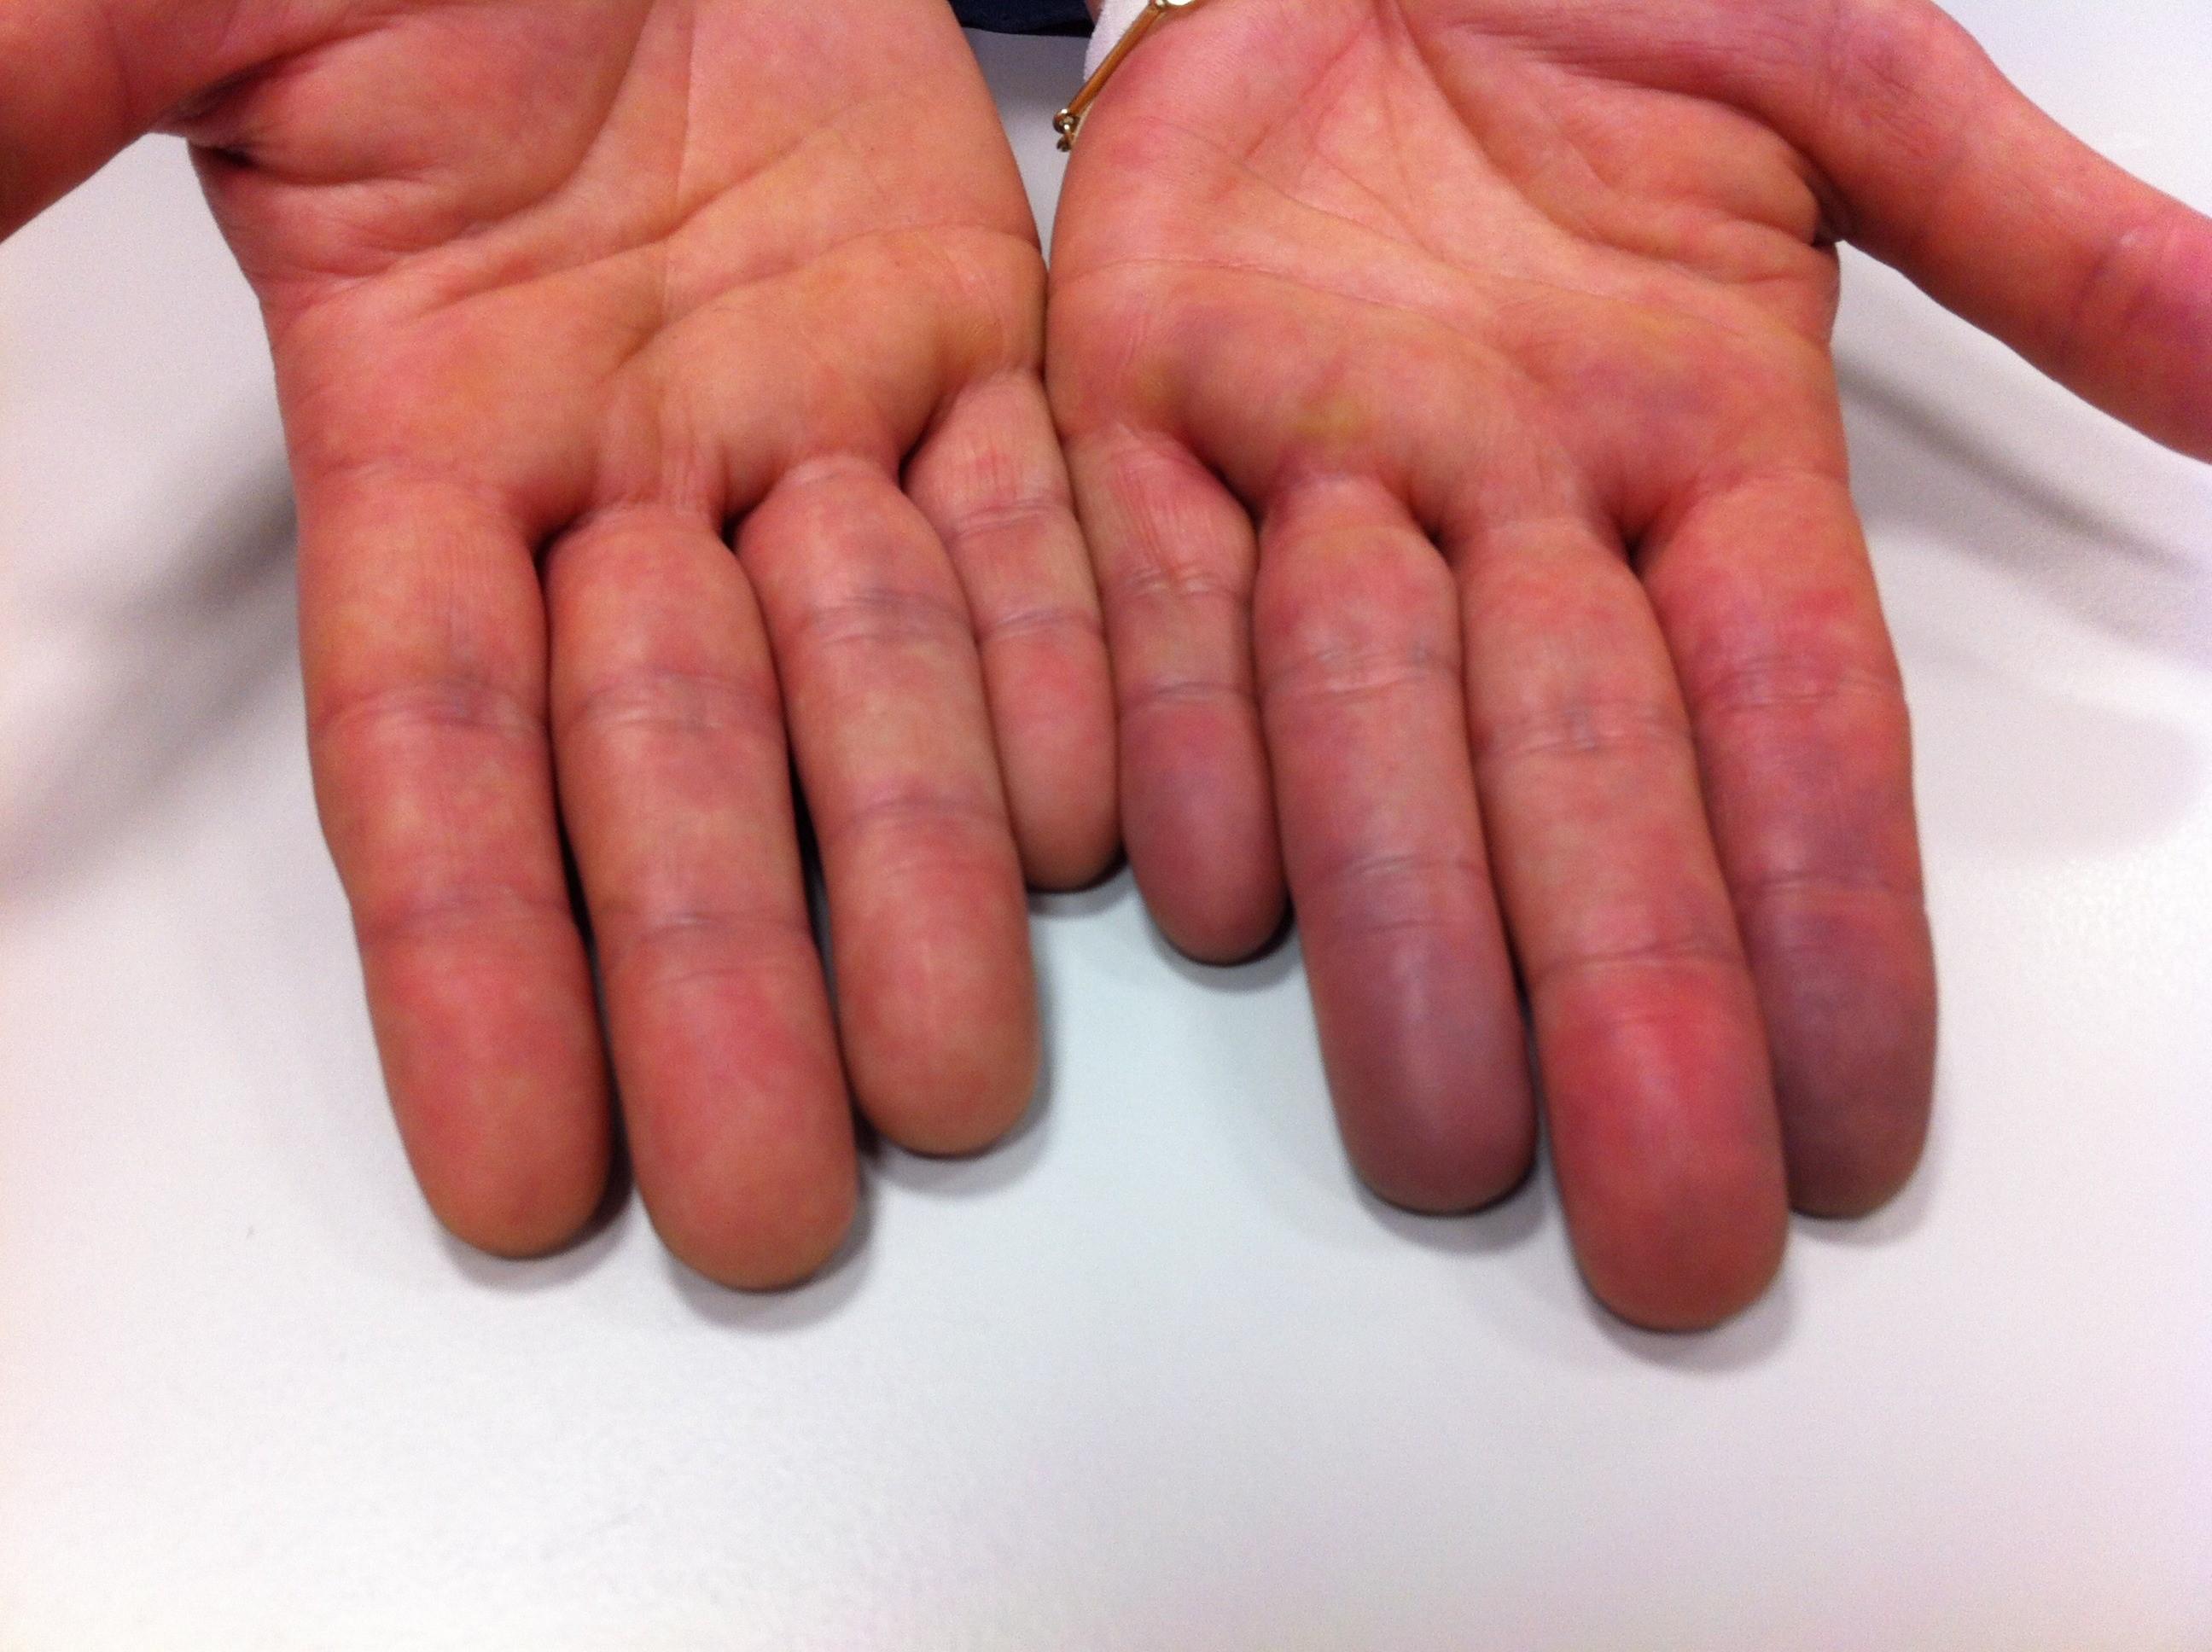 Пальцы синюшного цвета